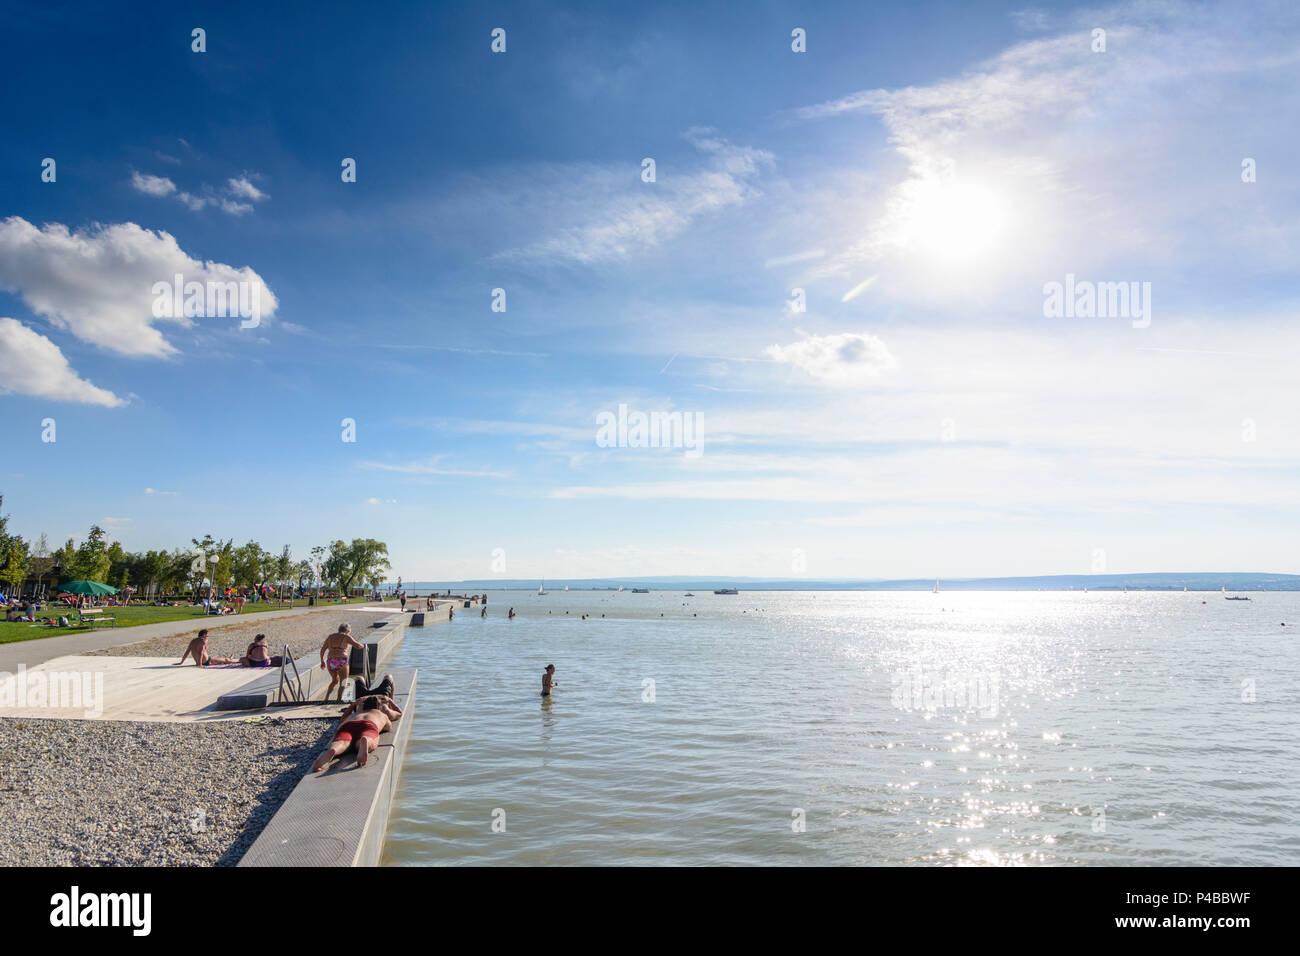 Illmitz, public bathing beach lido, Lake Neusiedl (Neusiedler See), swimmer, sailboat, sunbather, national park Neusiedler See-Seewinkel, Burgenland, Austria - Stock Image